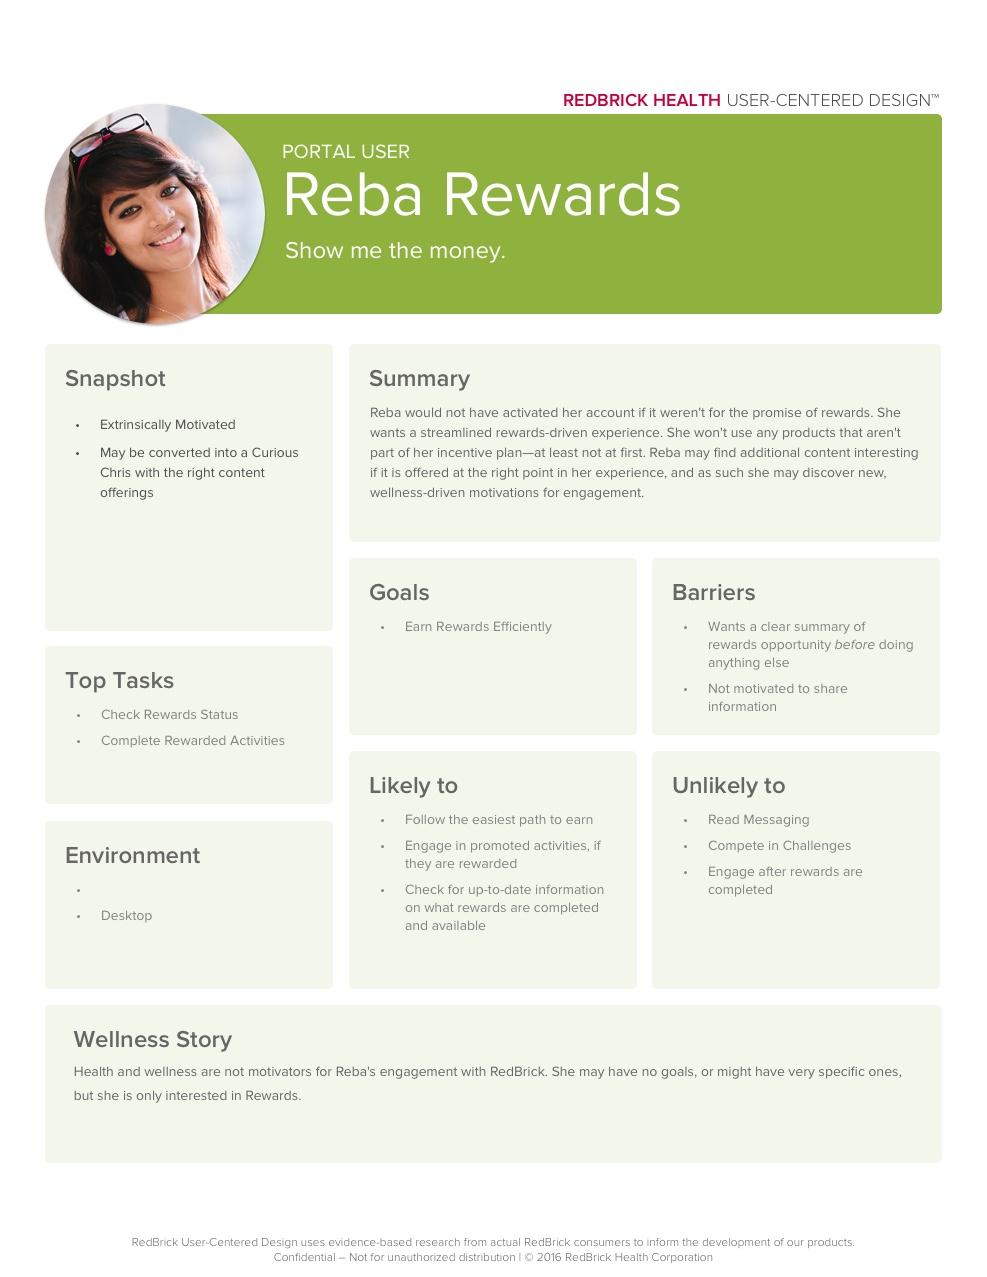 Portal User - Reba Rewards.jpg